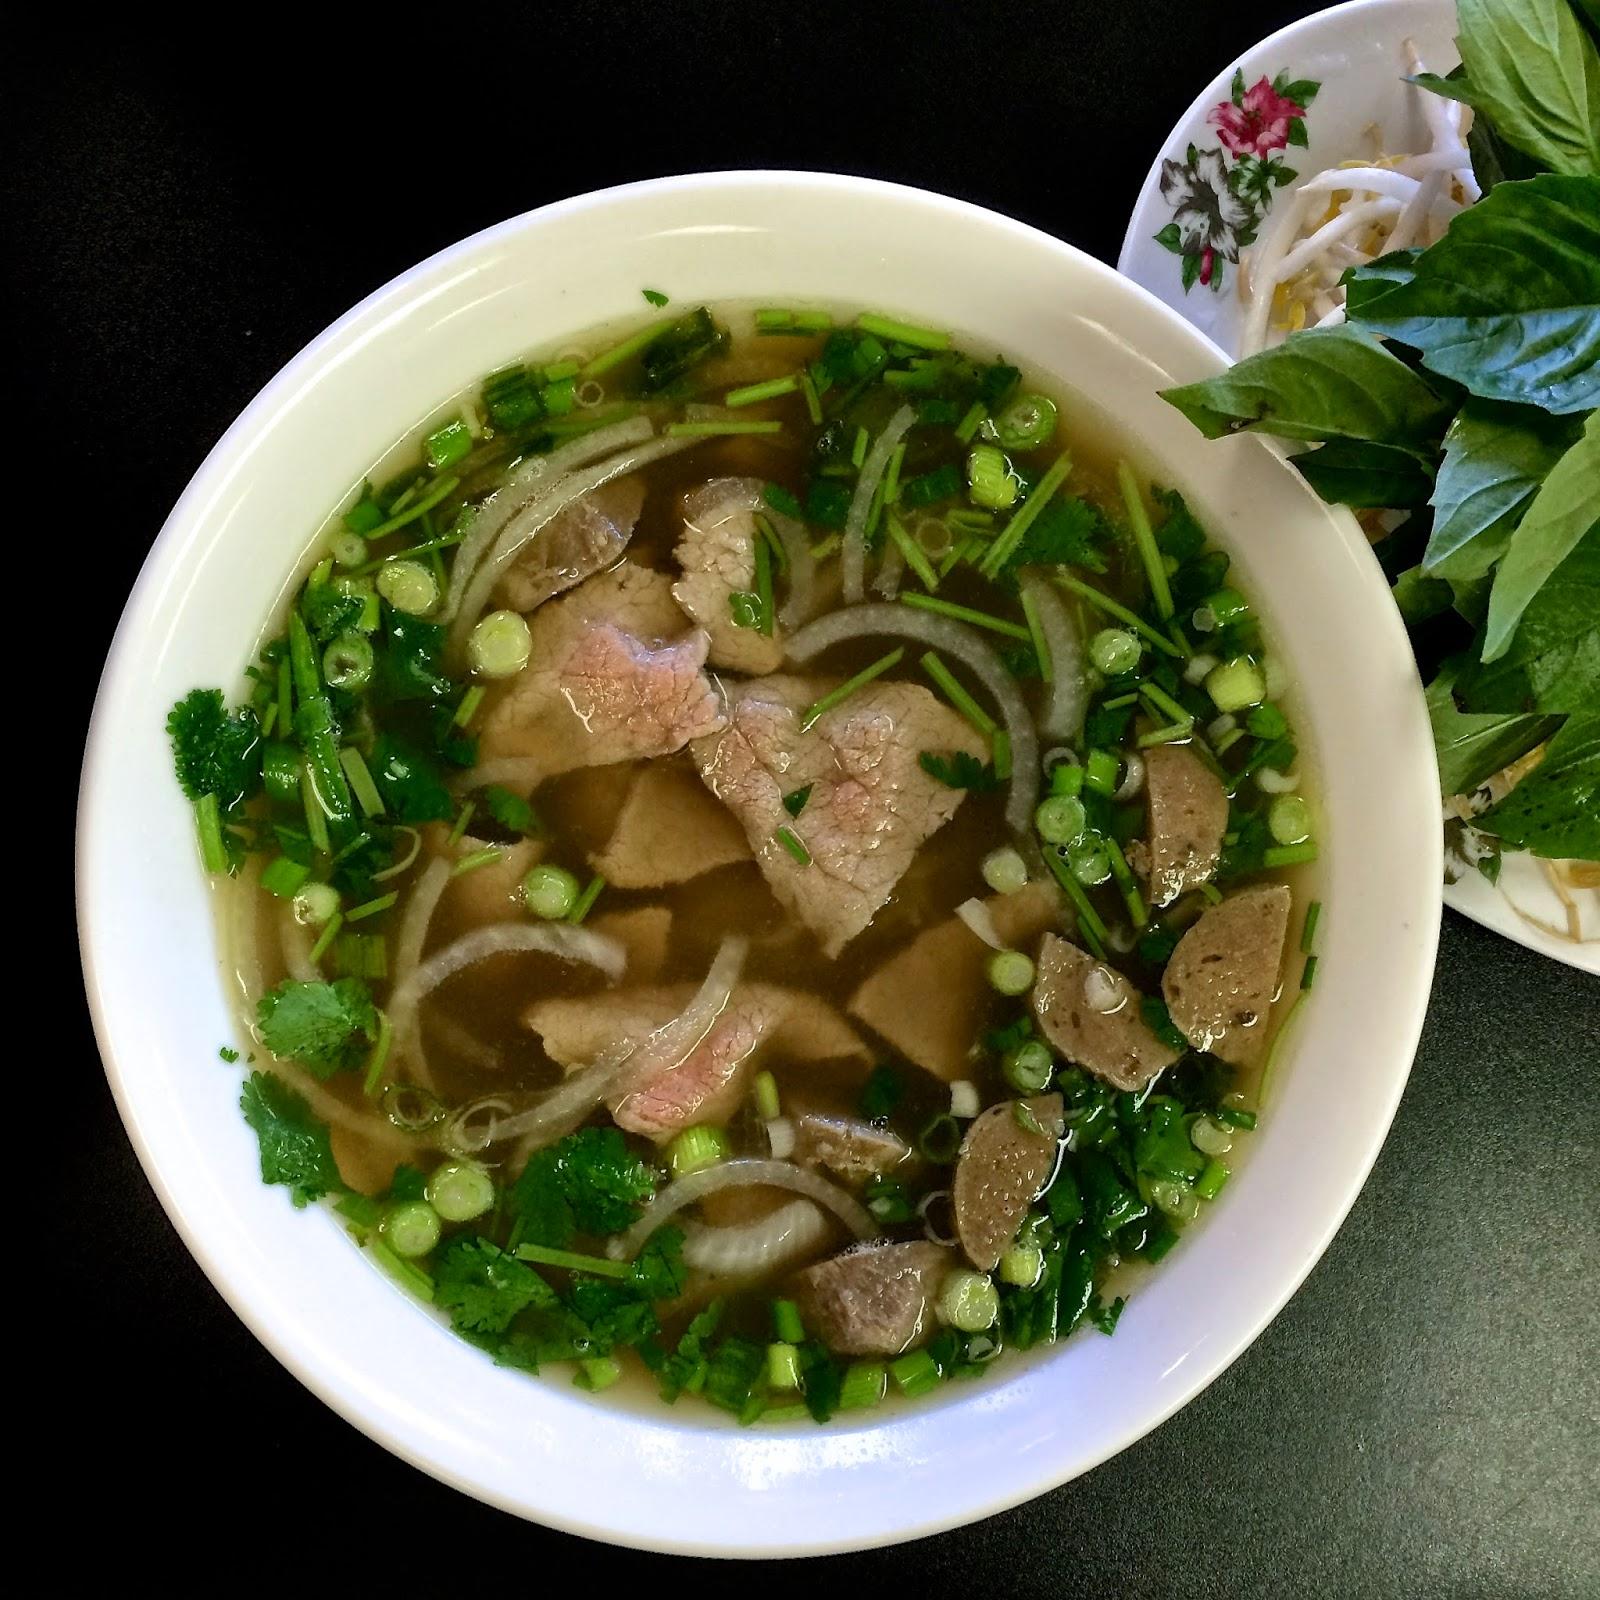 Sa Dec's Pho Tai Bo Vien: Rare Beef & Beef Ball Noodle Soup $8